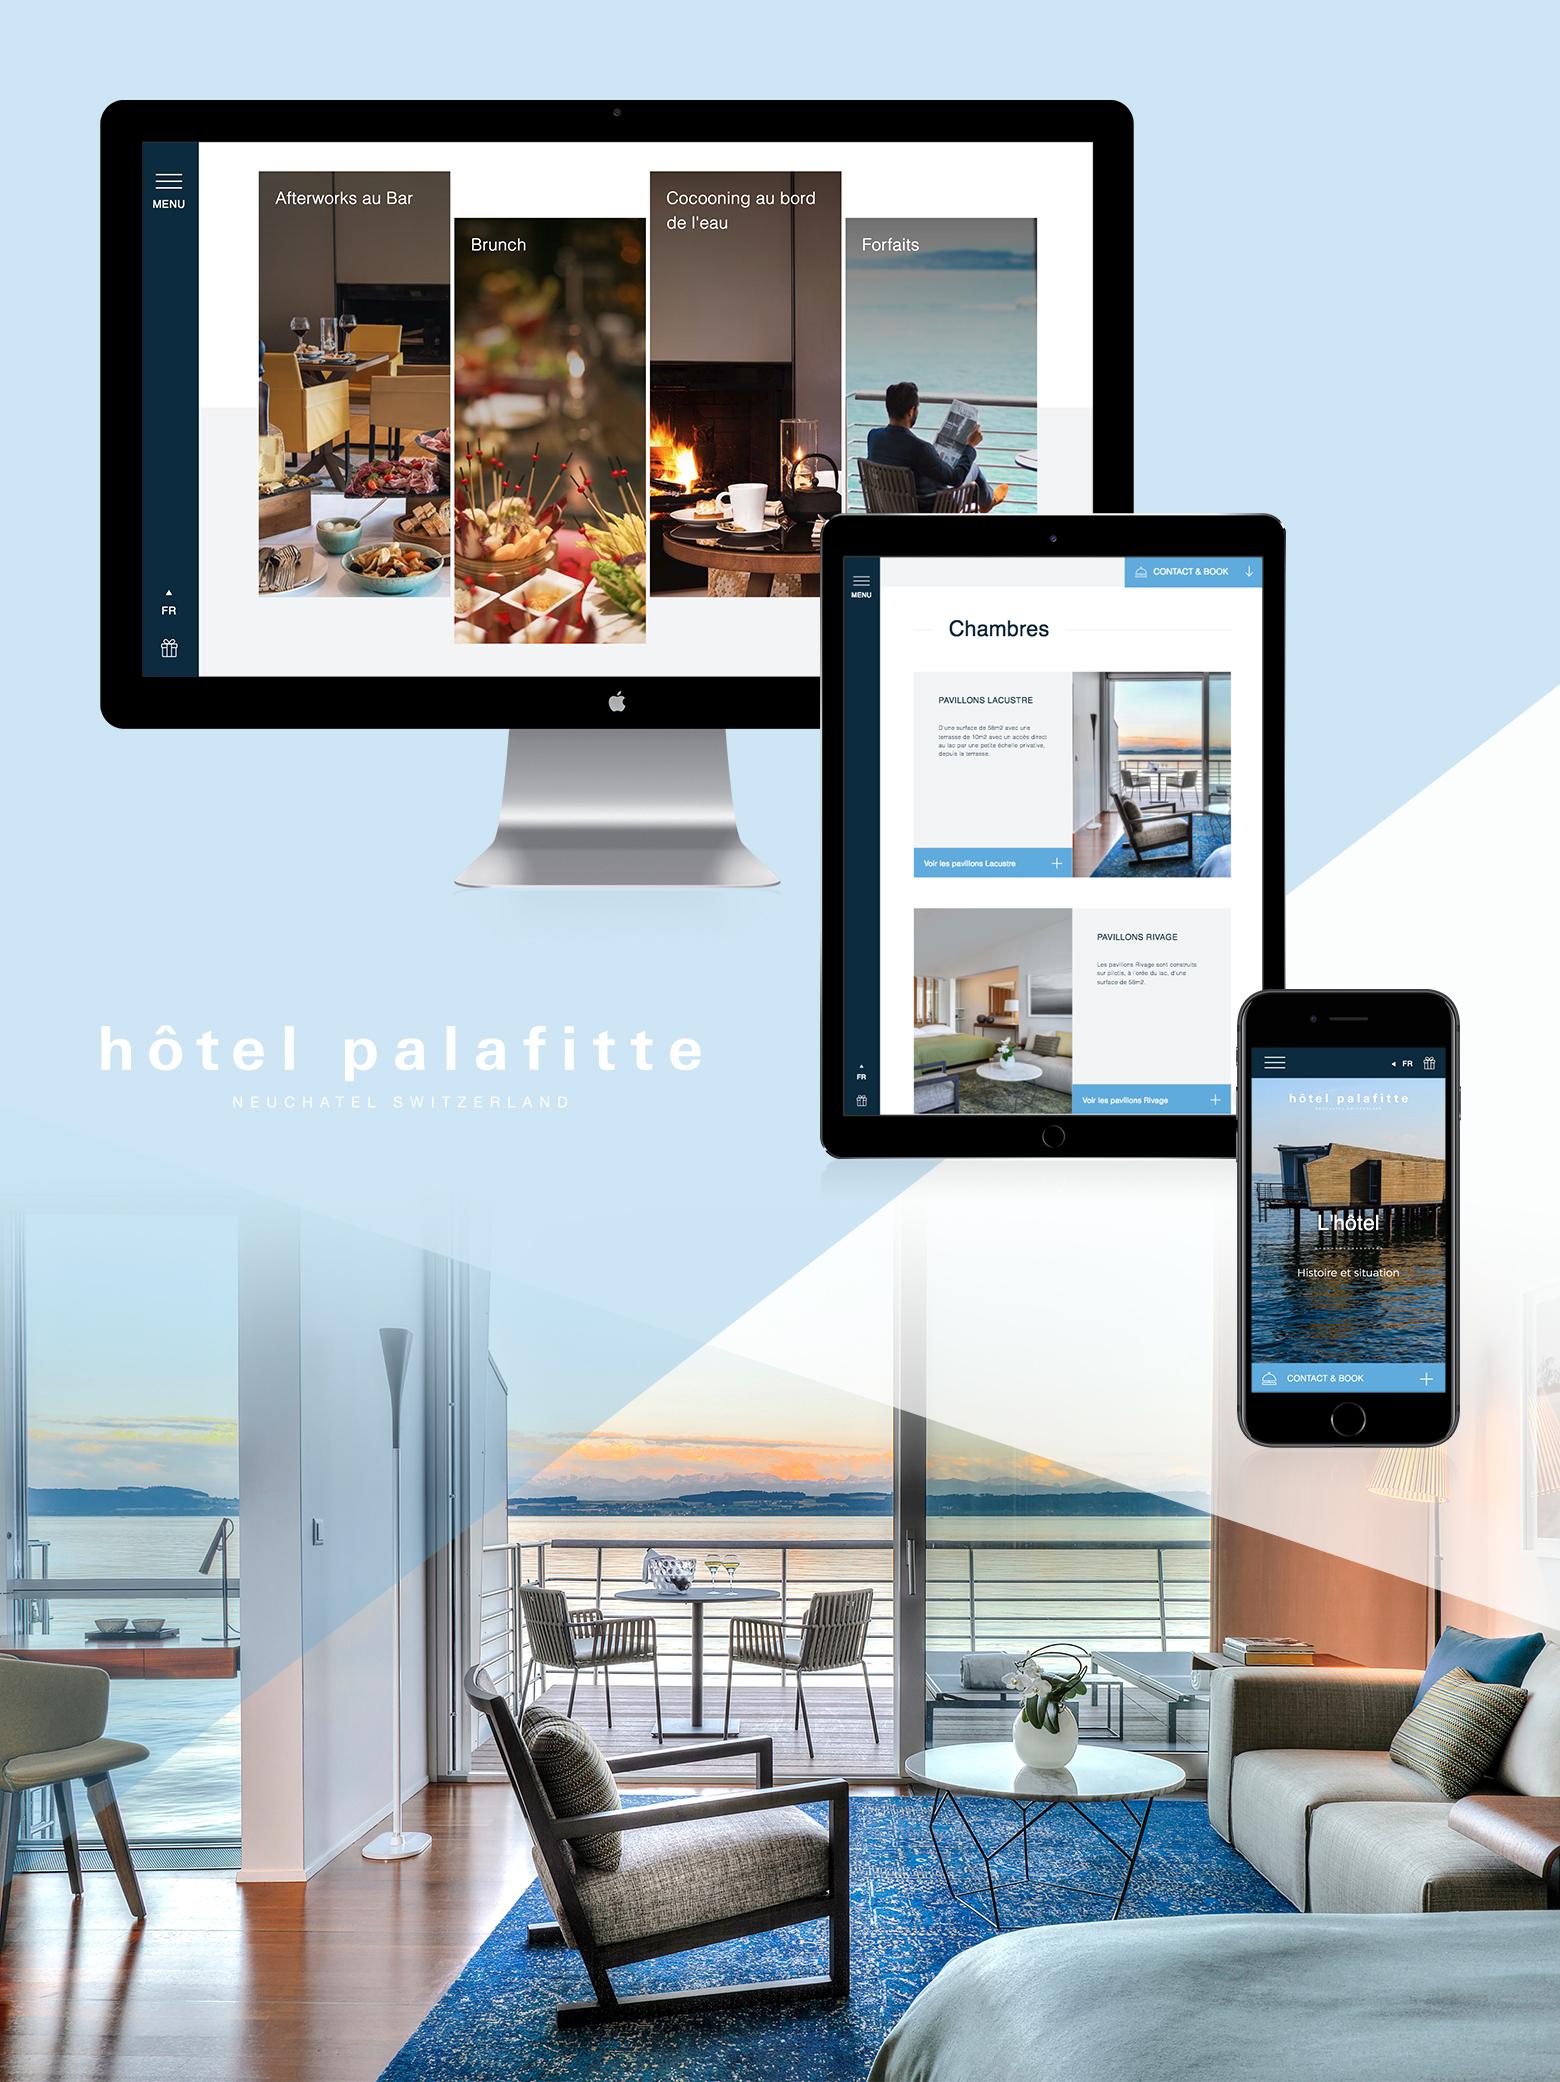 Hôtel Palafitte Neuchâtel WNG Agence Digitale